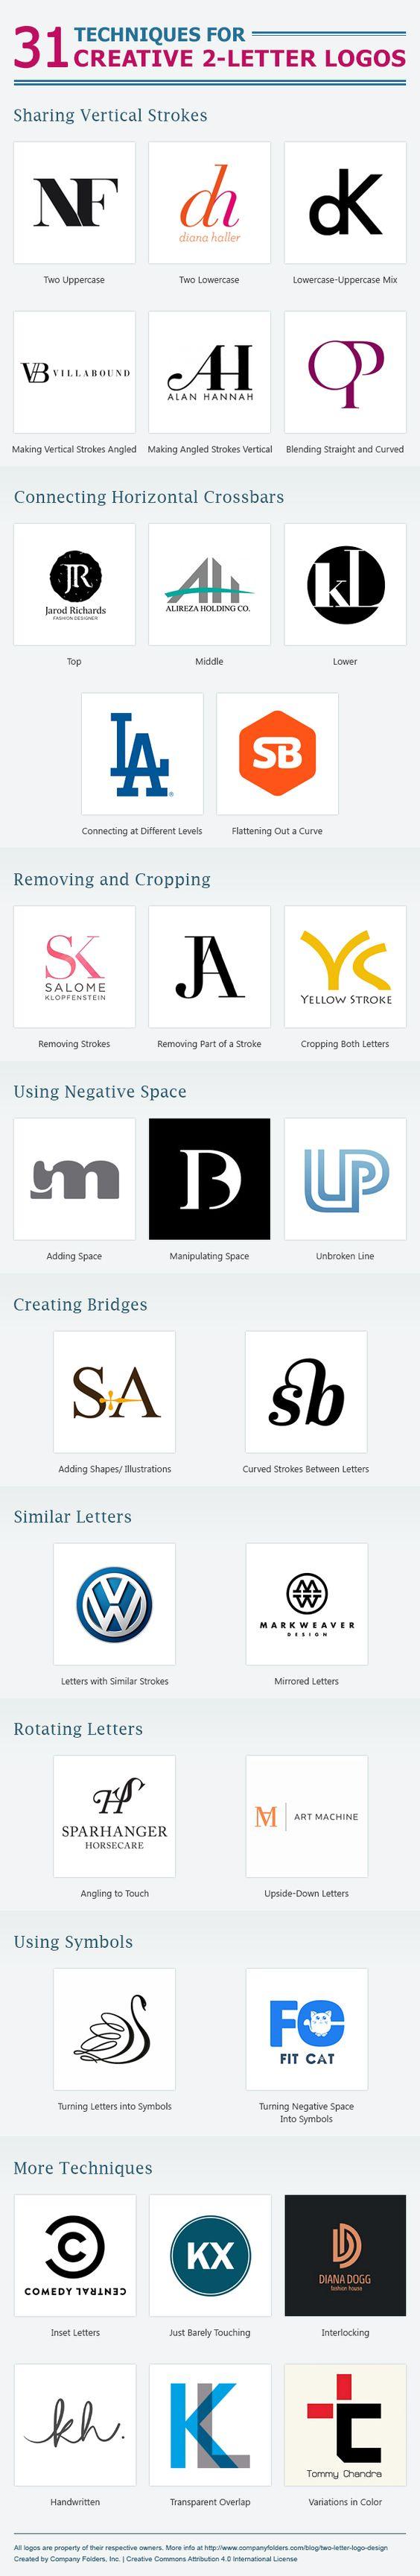 logotipos 2016 5